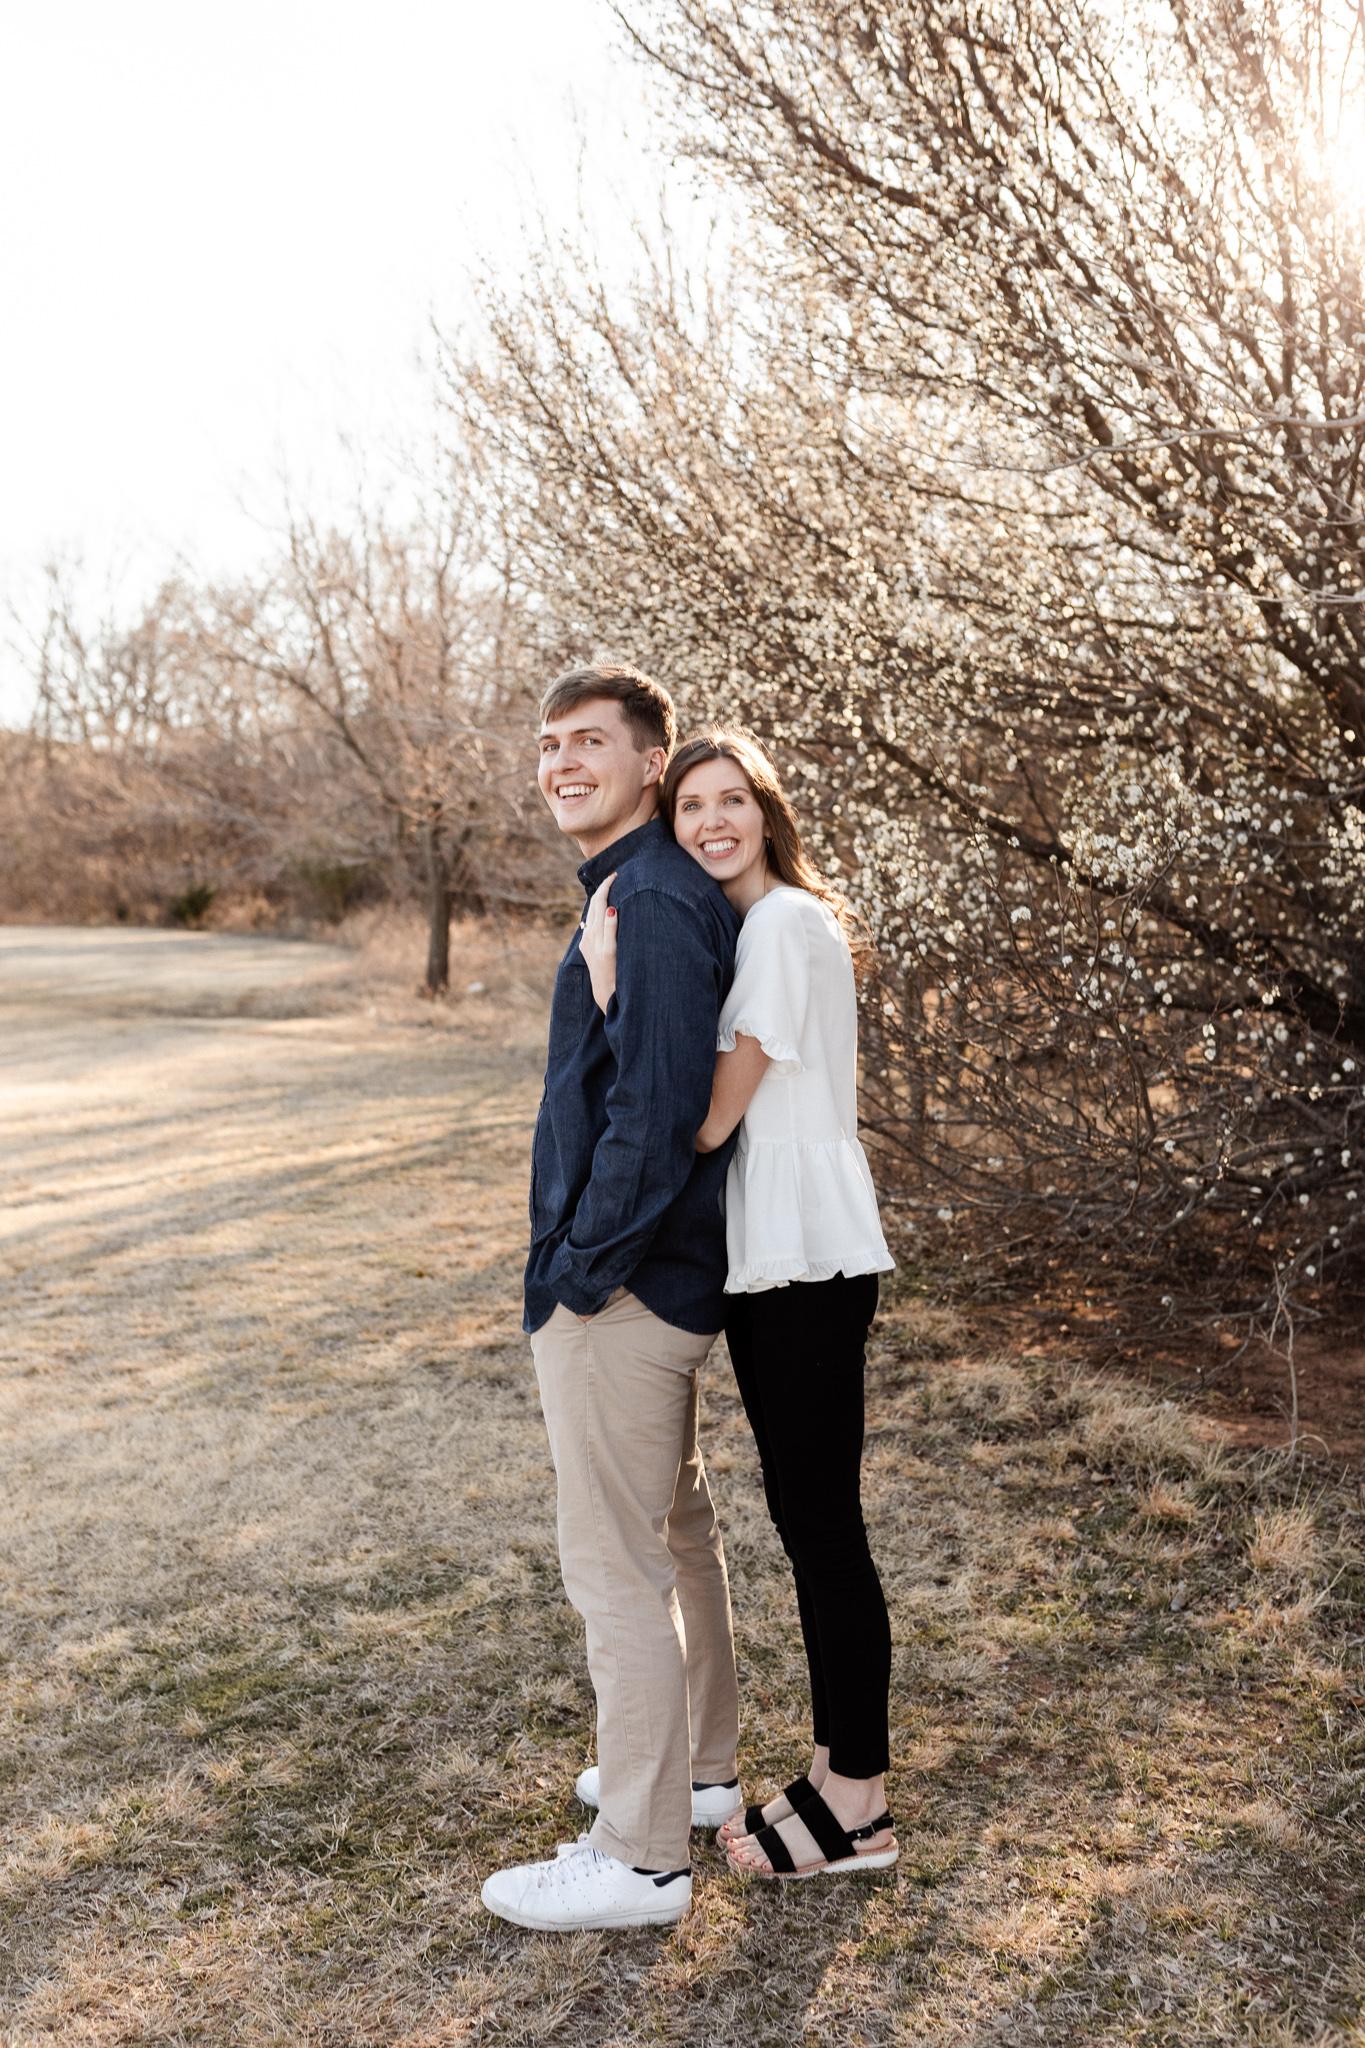 Browne | Timeless Downtown Engagements | Oklahoma Wedding Photographer-8.jpg